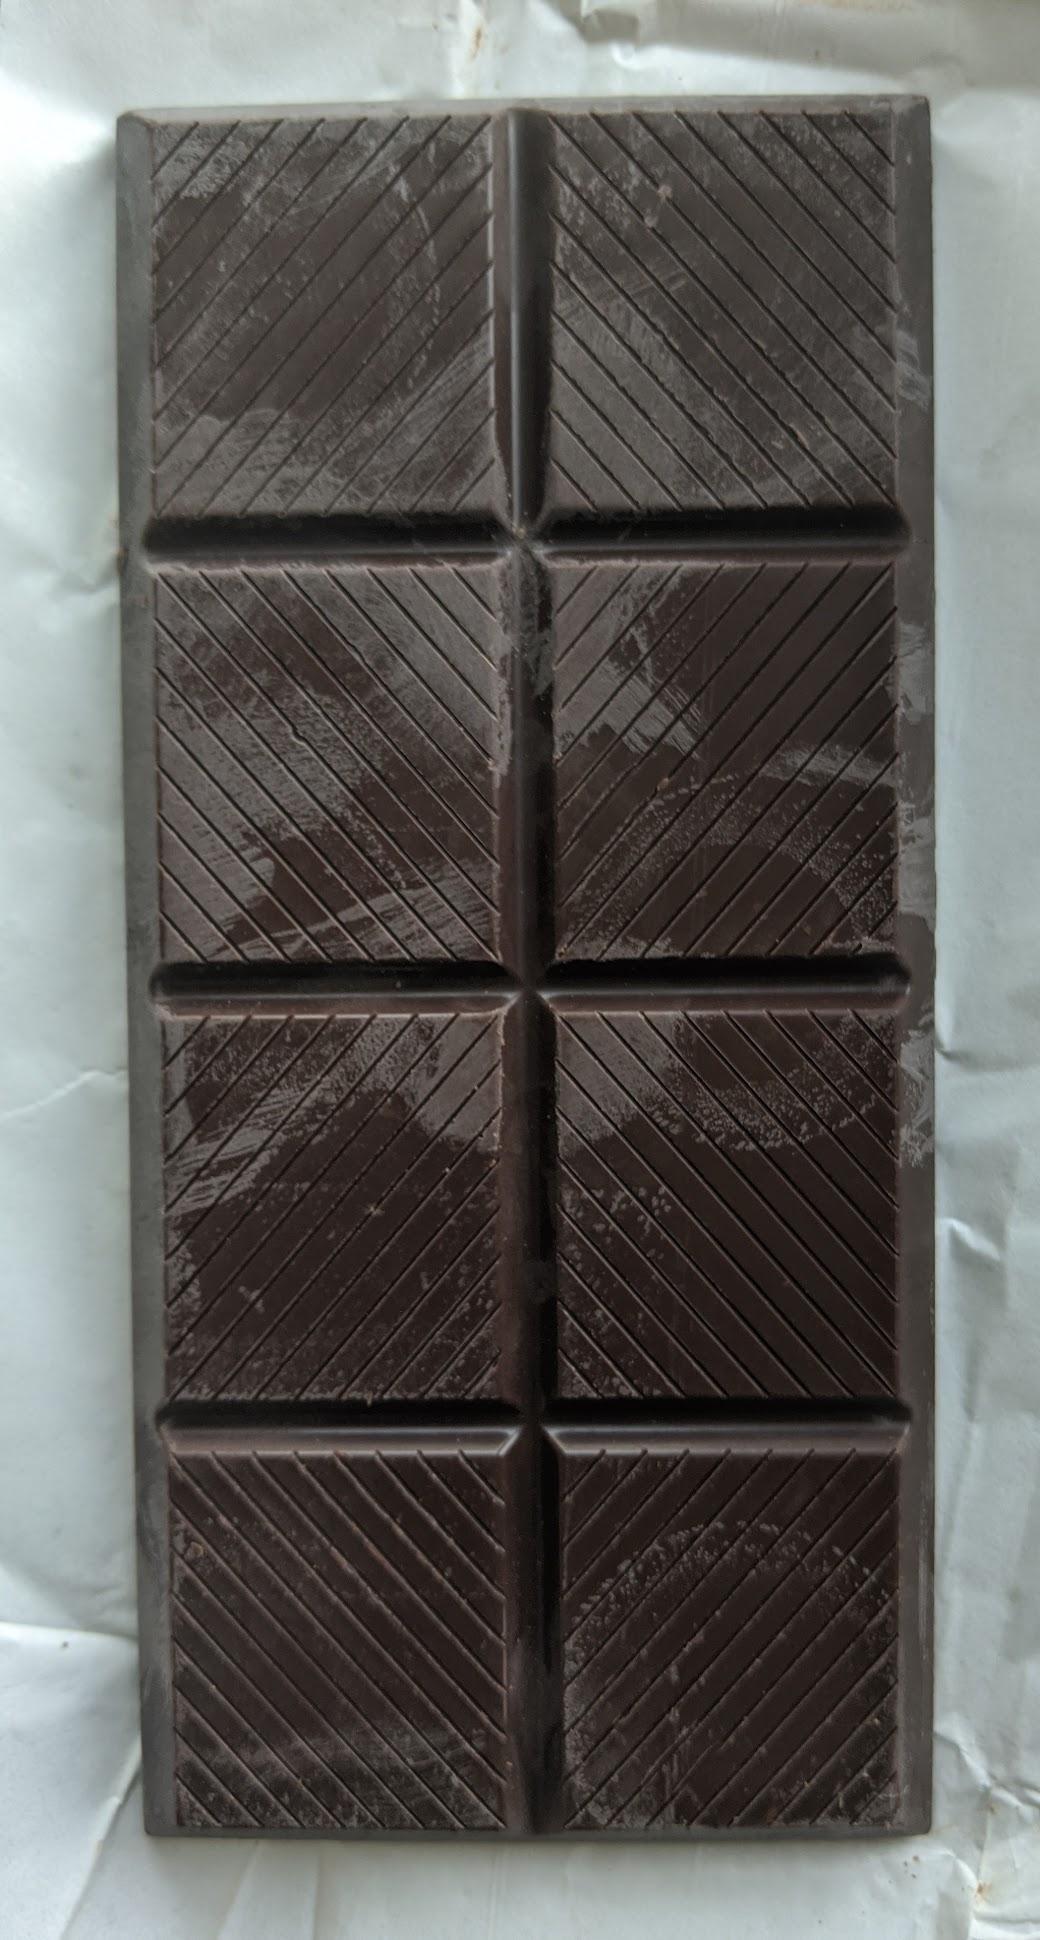 72% seattle chocolate bar